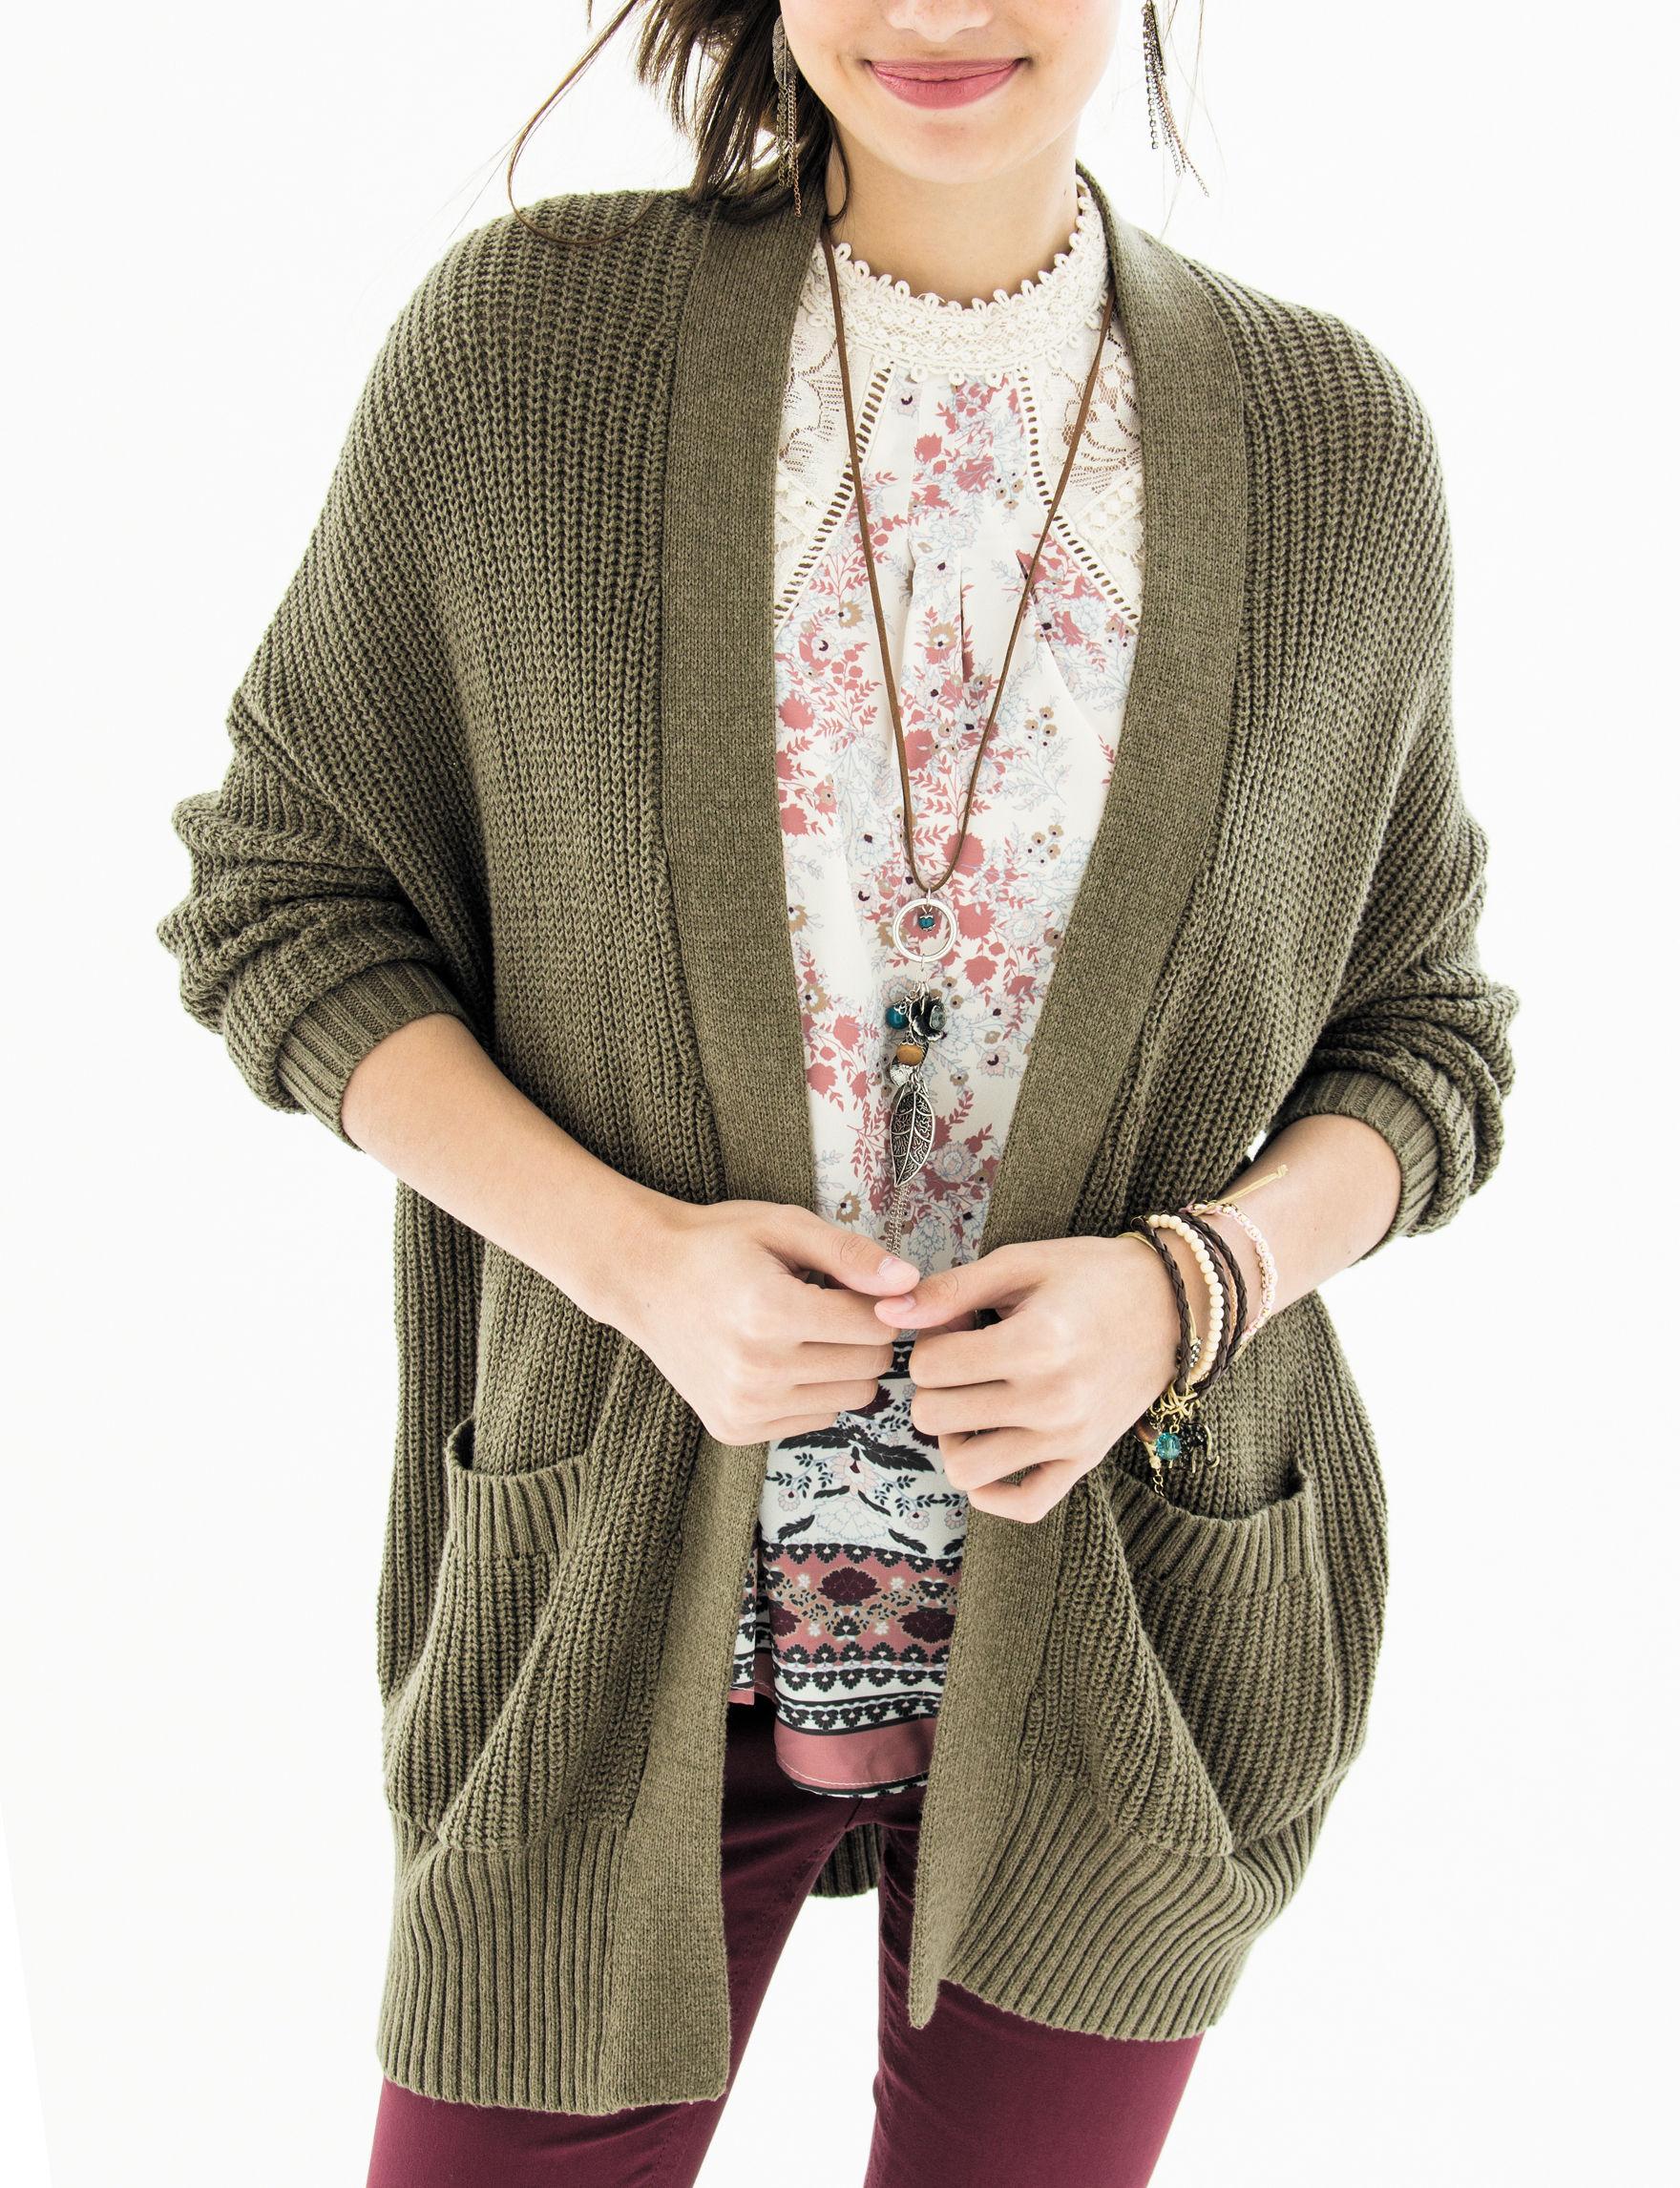 Ultra Flirt Olive Cardigans Sweaters